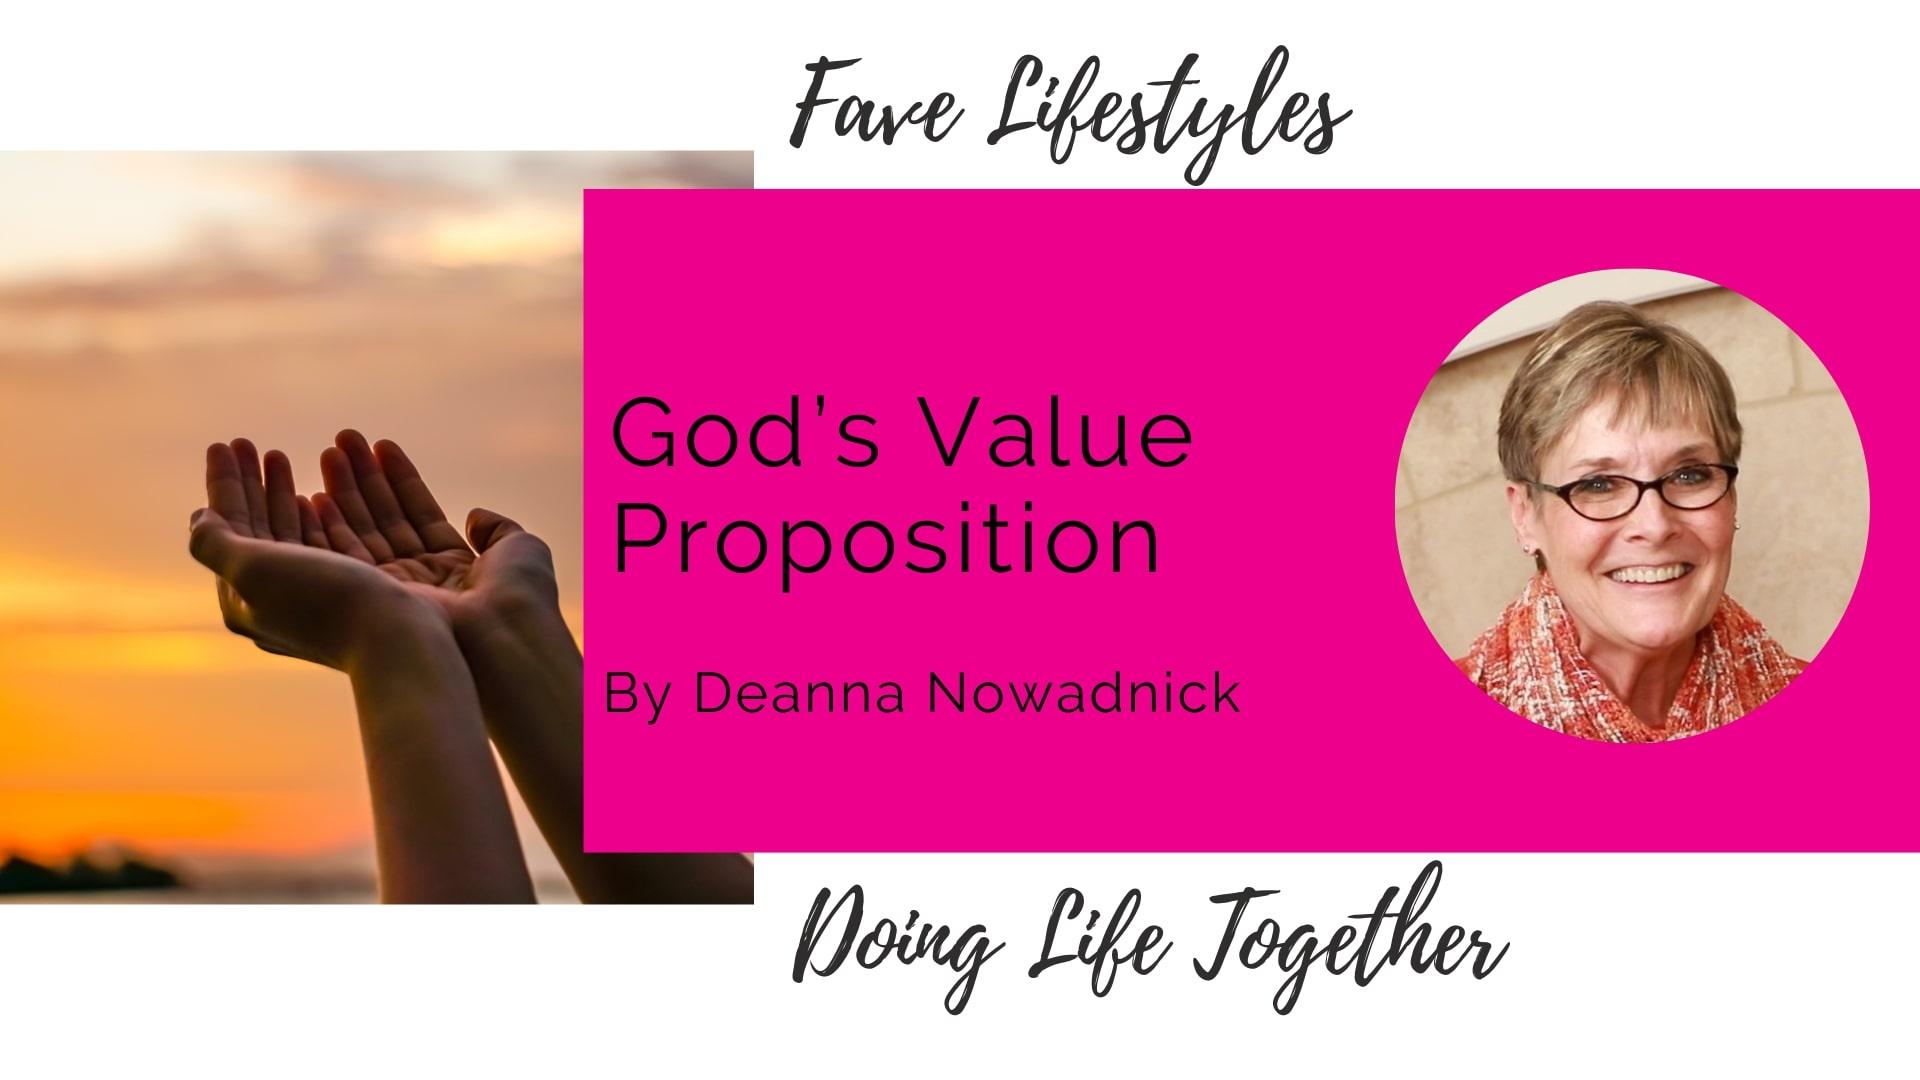 God's Value Proposition